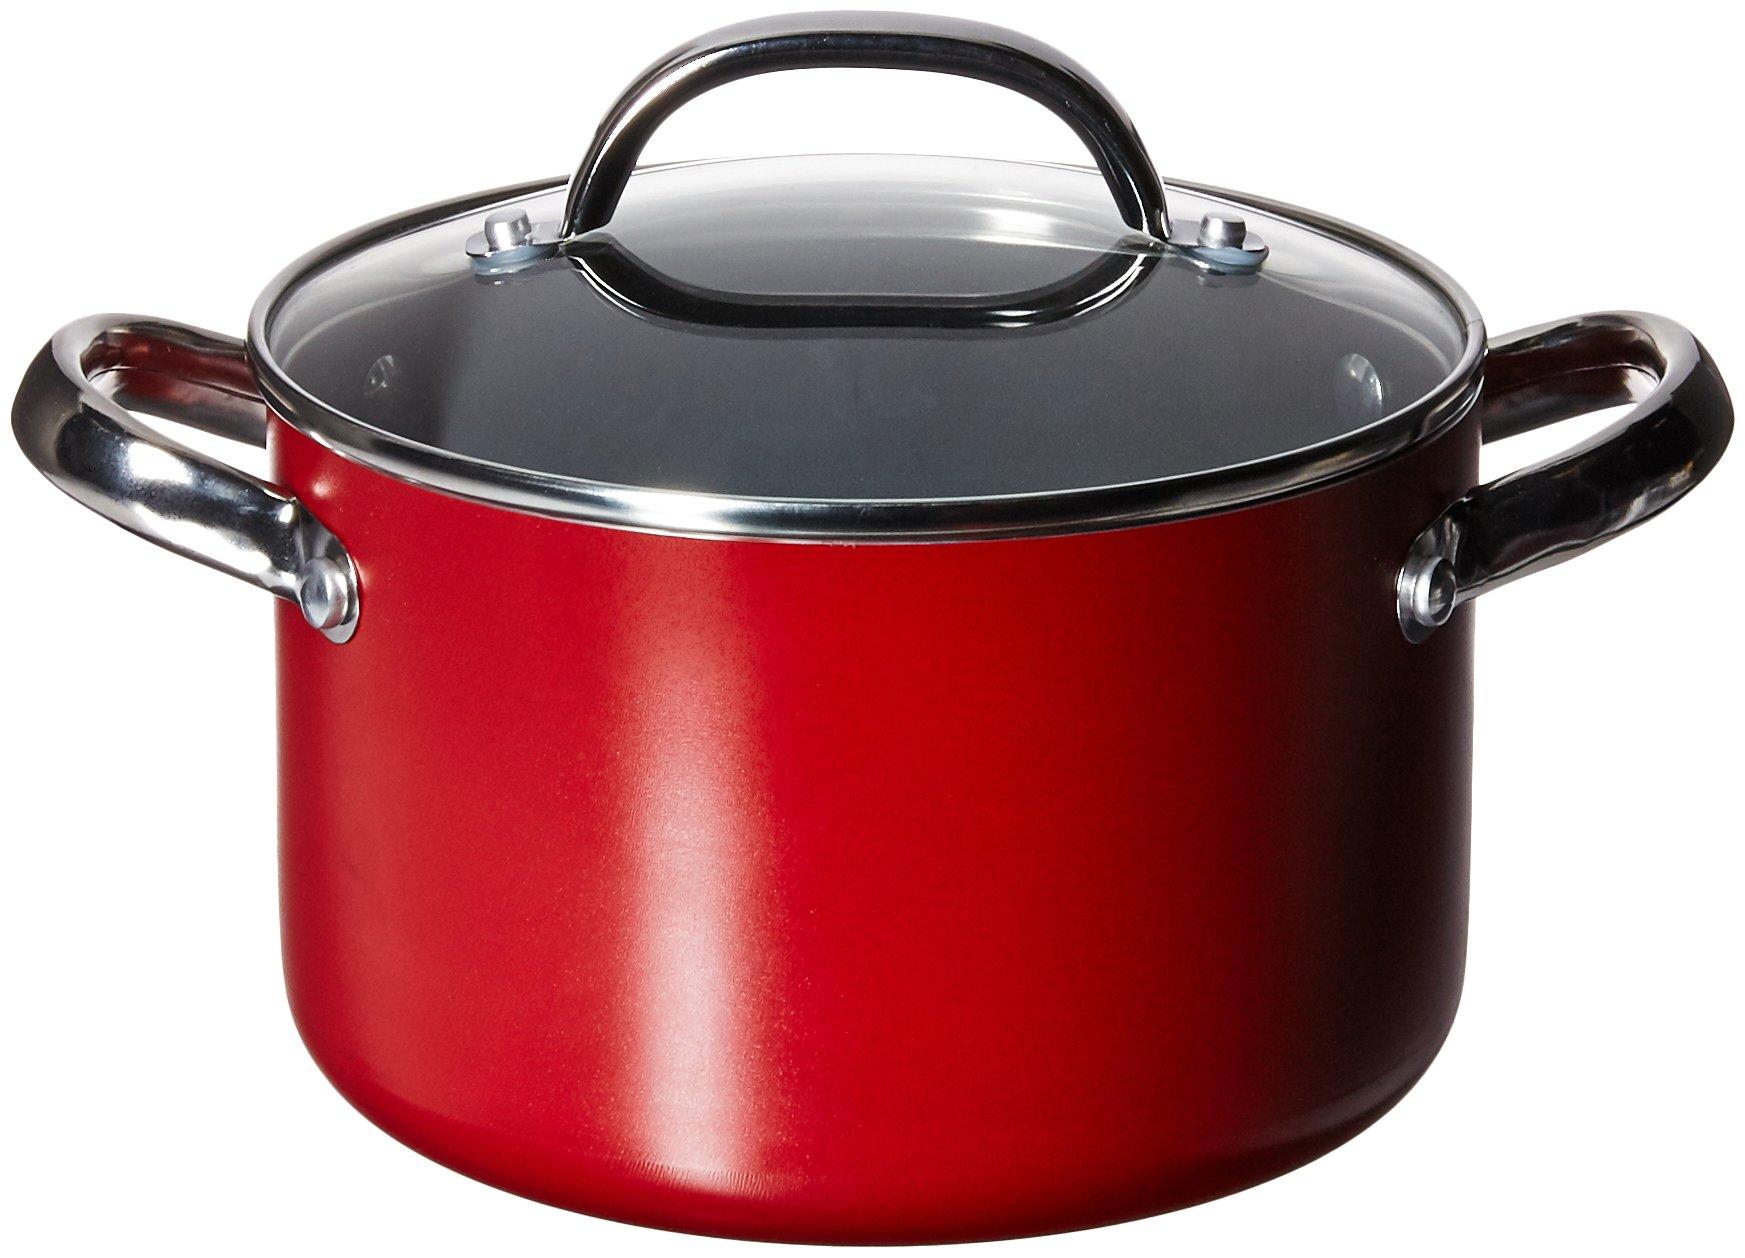 Farberware Buena Cocina Aluminum Nonstick Covered Soup Pot, 4-Quart, Red by Farberware